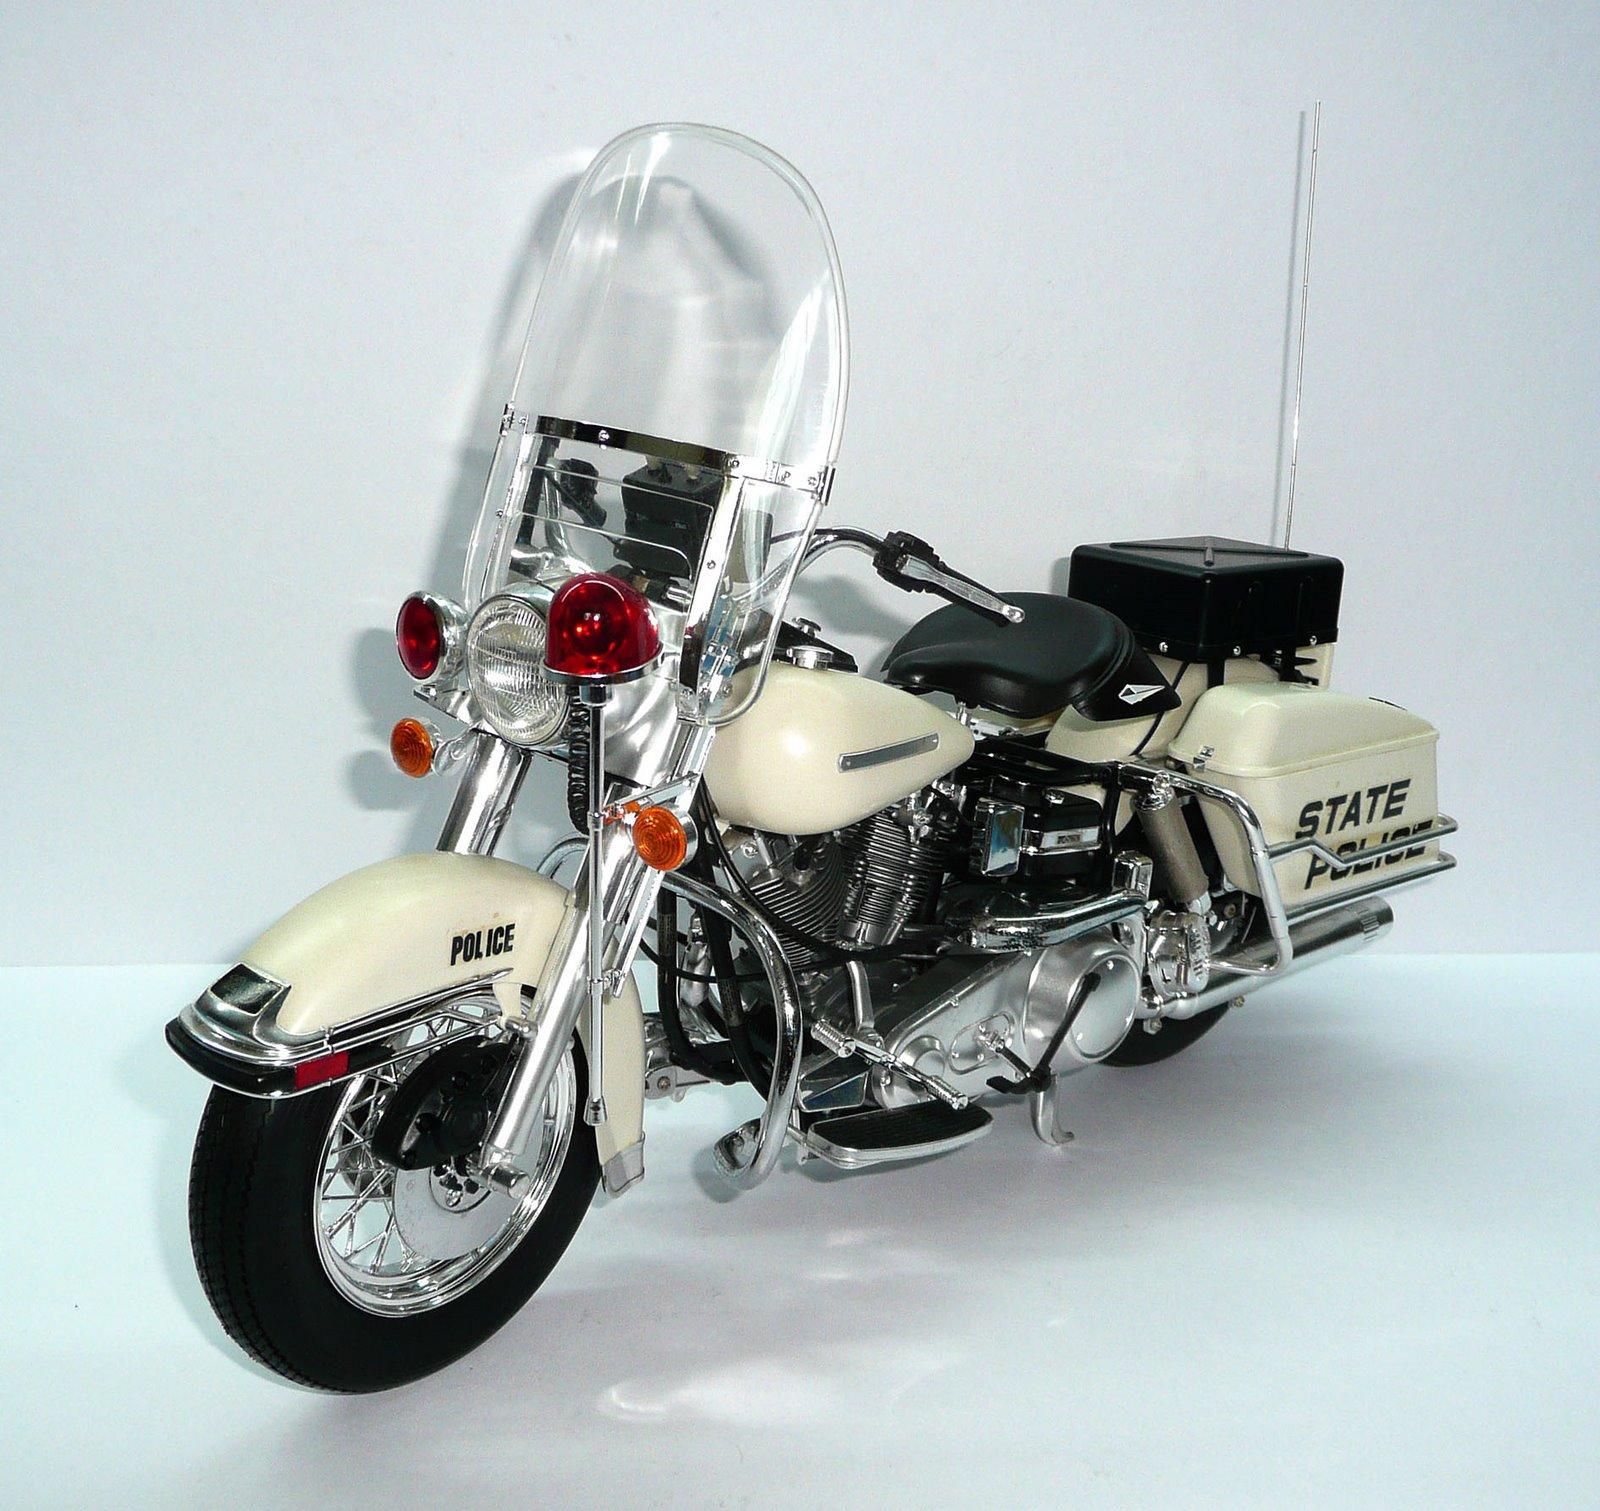 1988 Harley-Davidson Police Bike